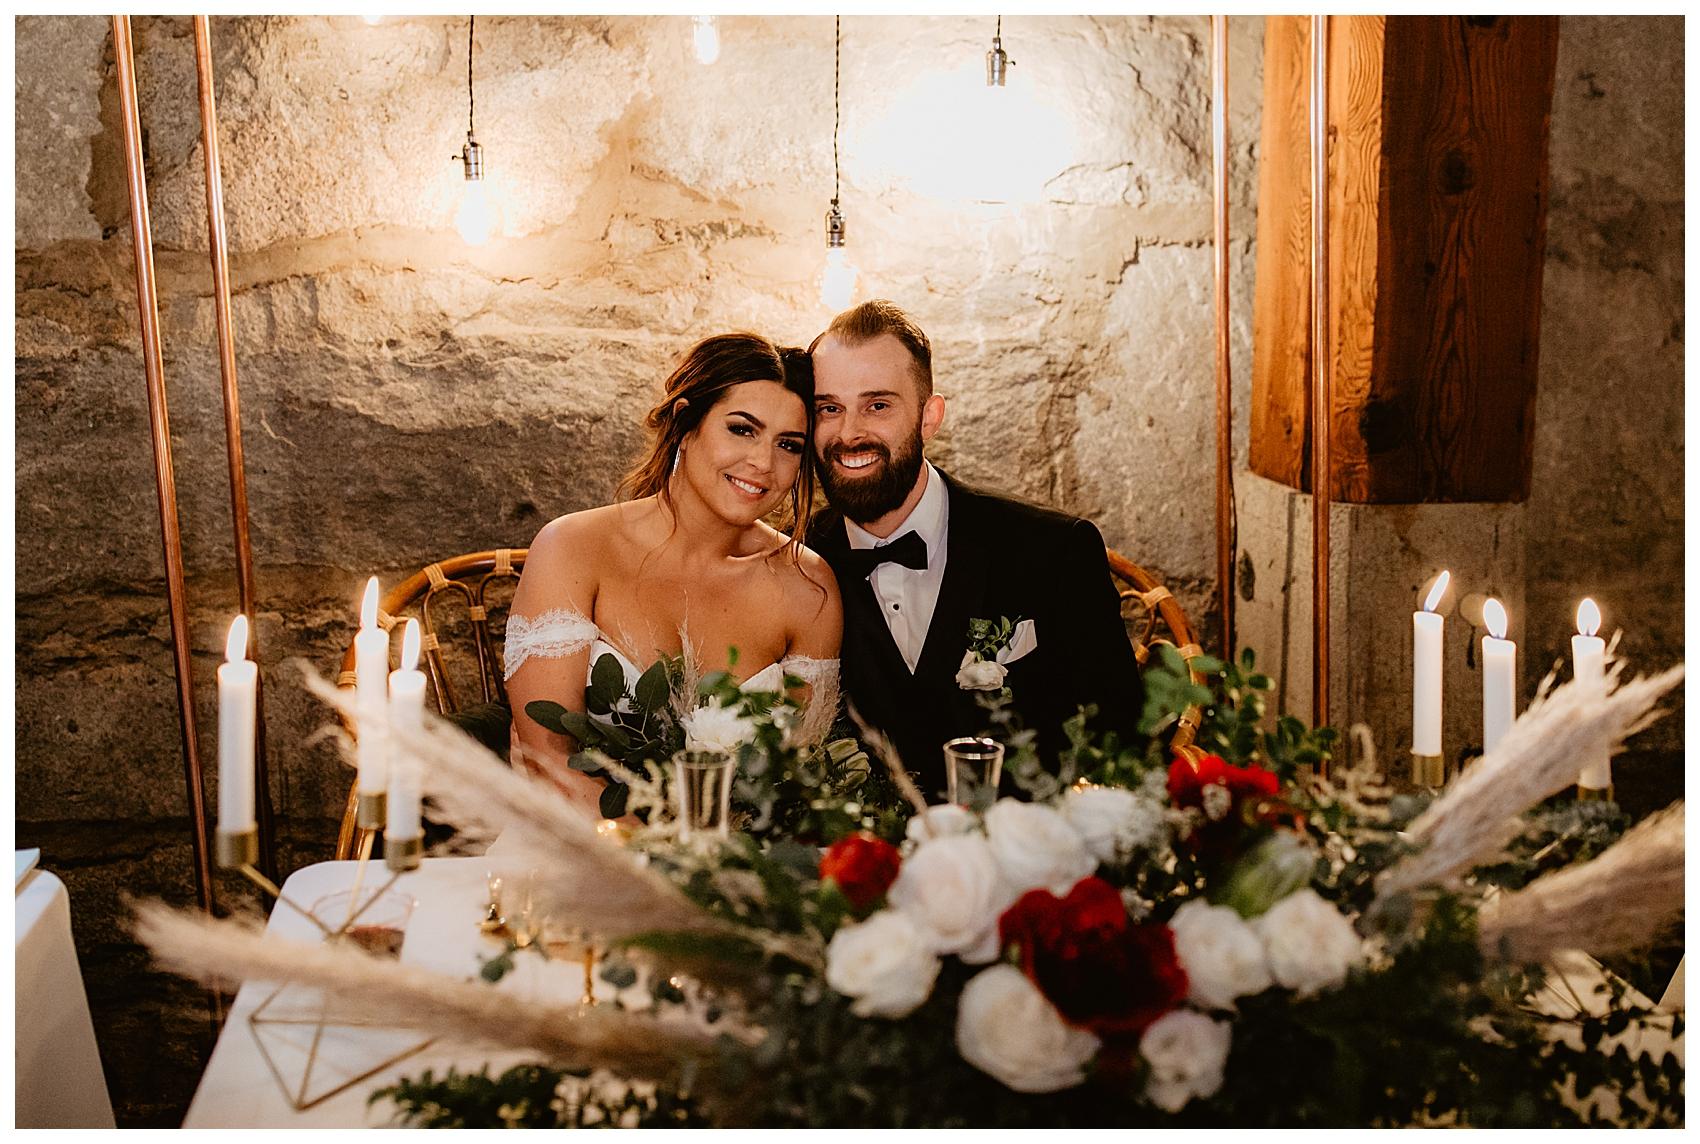 Chateau Rive Spokane Wedding Cassie Trottier Photography01097.jpg